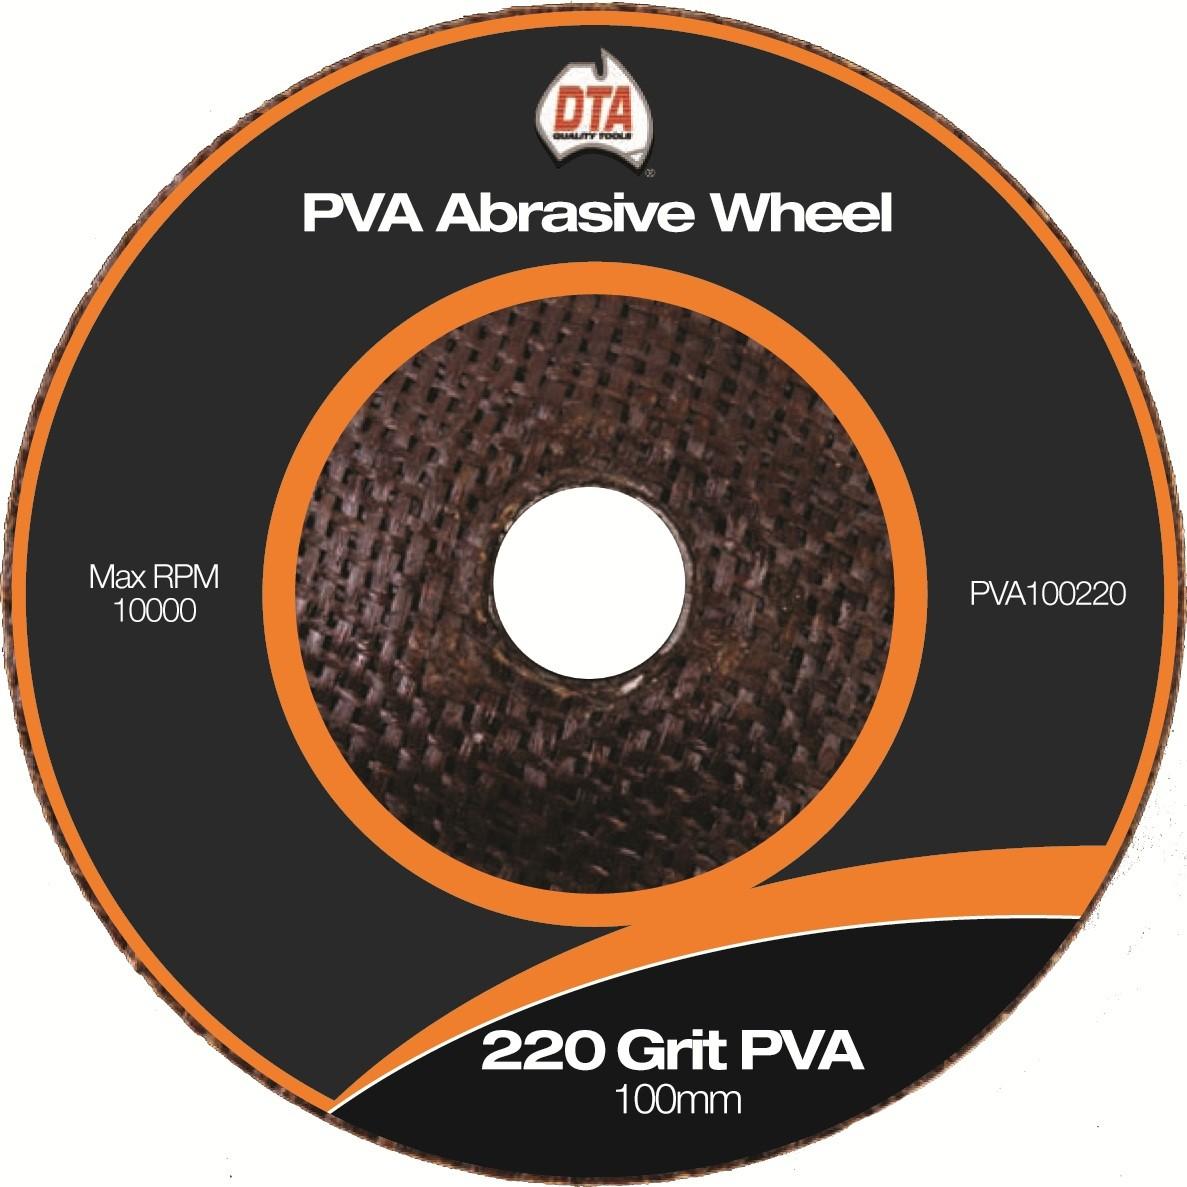 Dta Pva 4 Quot Abrasive Wheel 220 Grit Aladdin Outlet